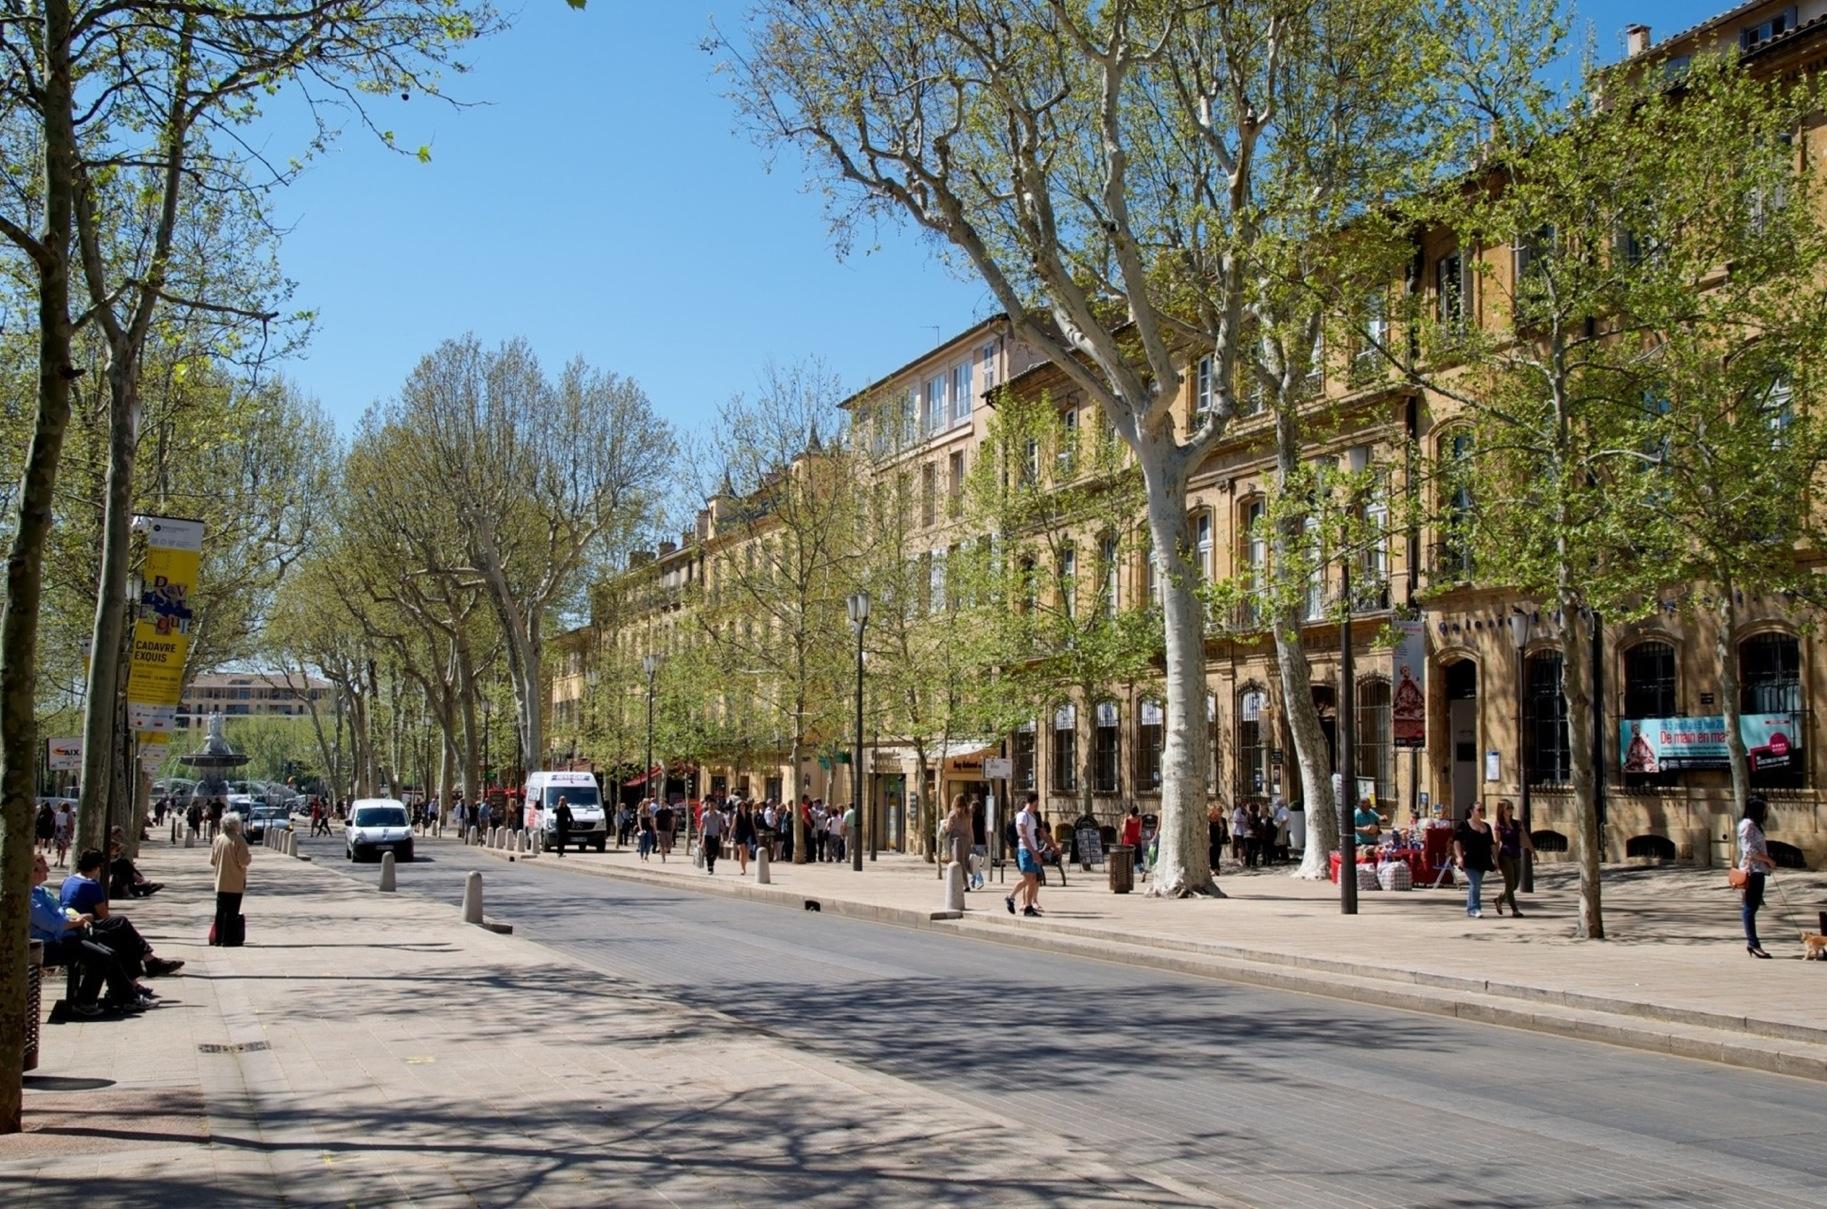 Marseille and Aix-en-Provence - Savannah Page 7